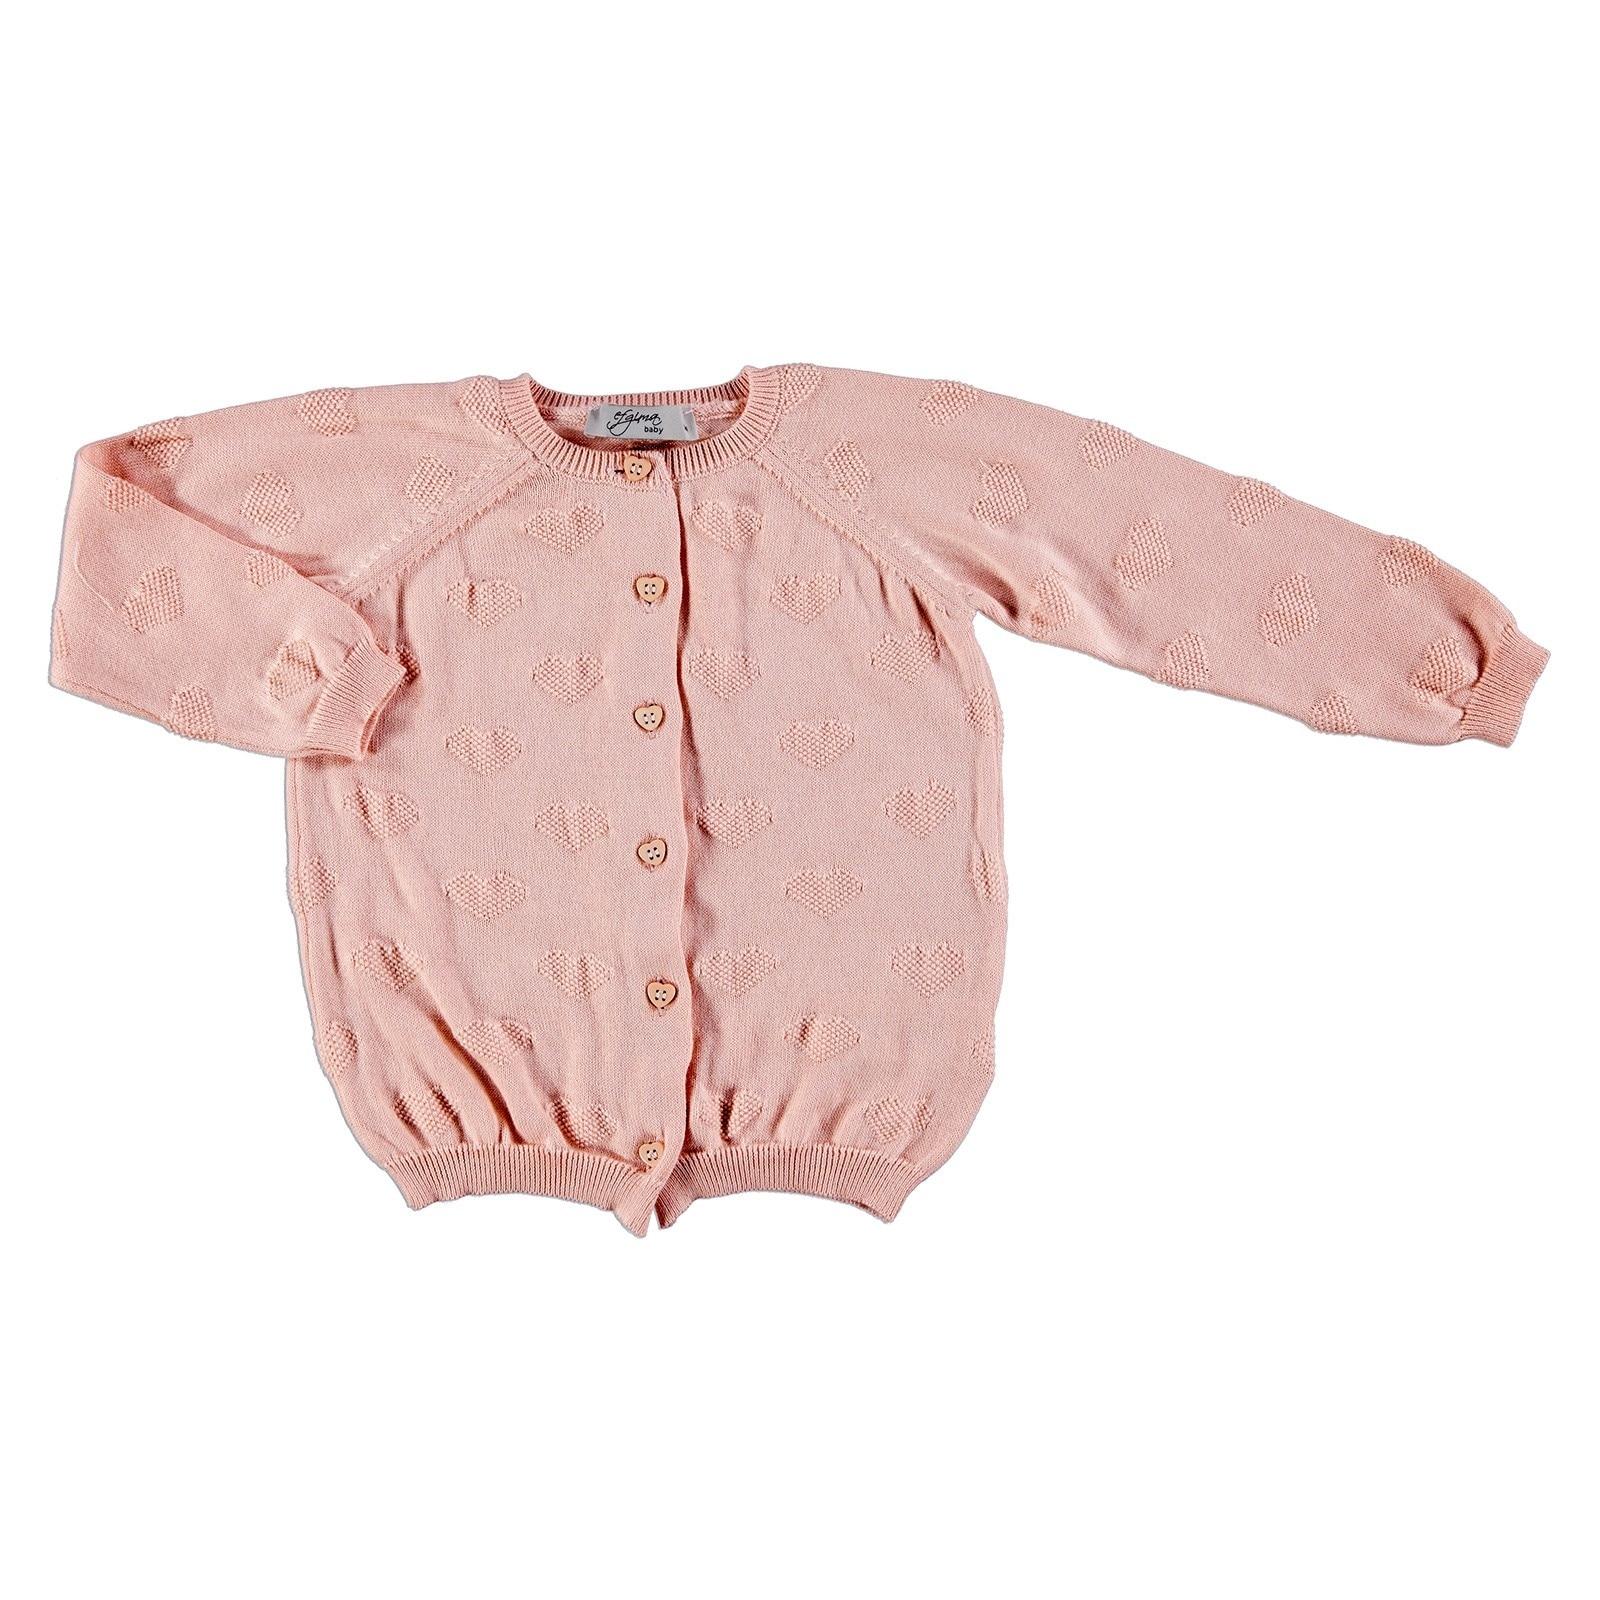 Ebebek Efgima Baby Winter Jacquard Heart Buttoned Knit Cardigan